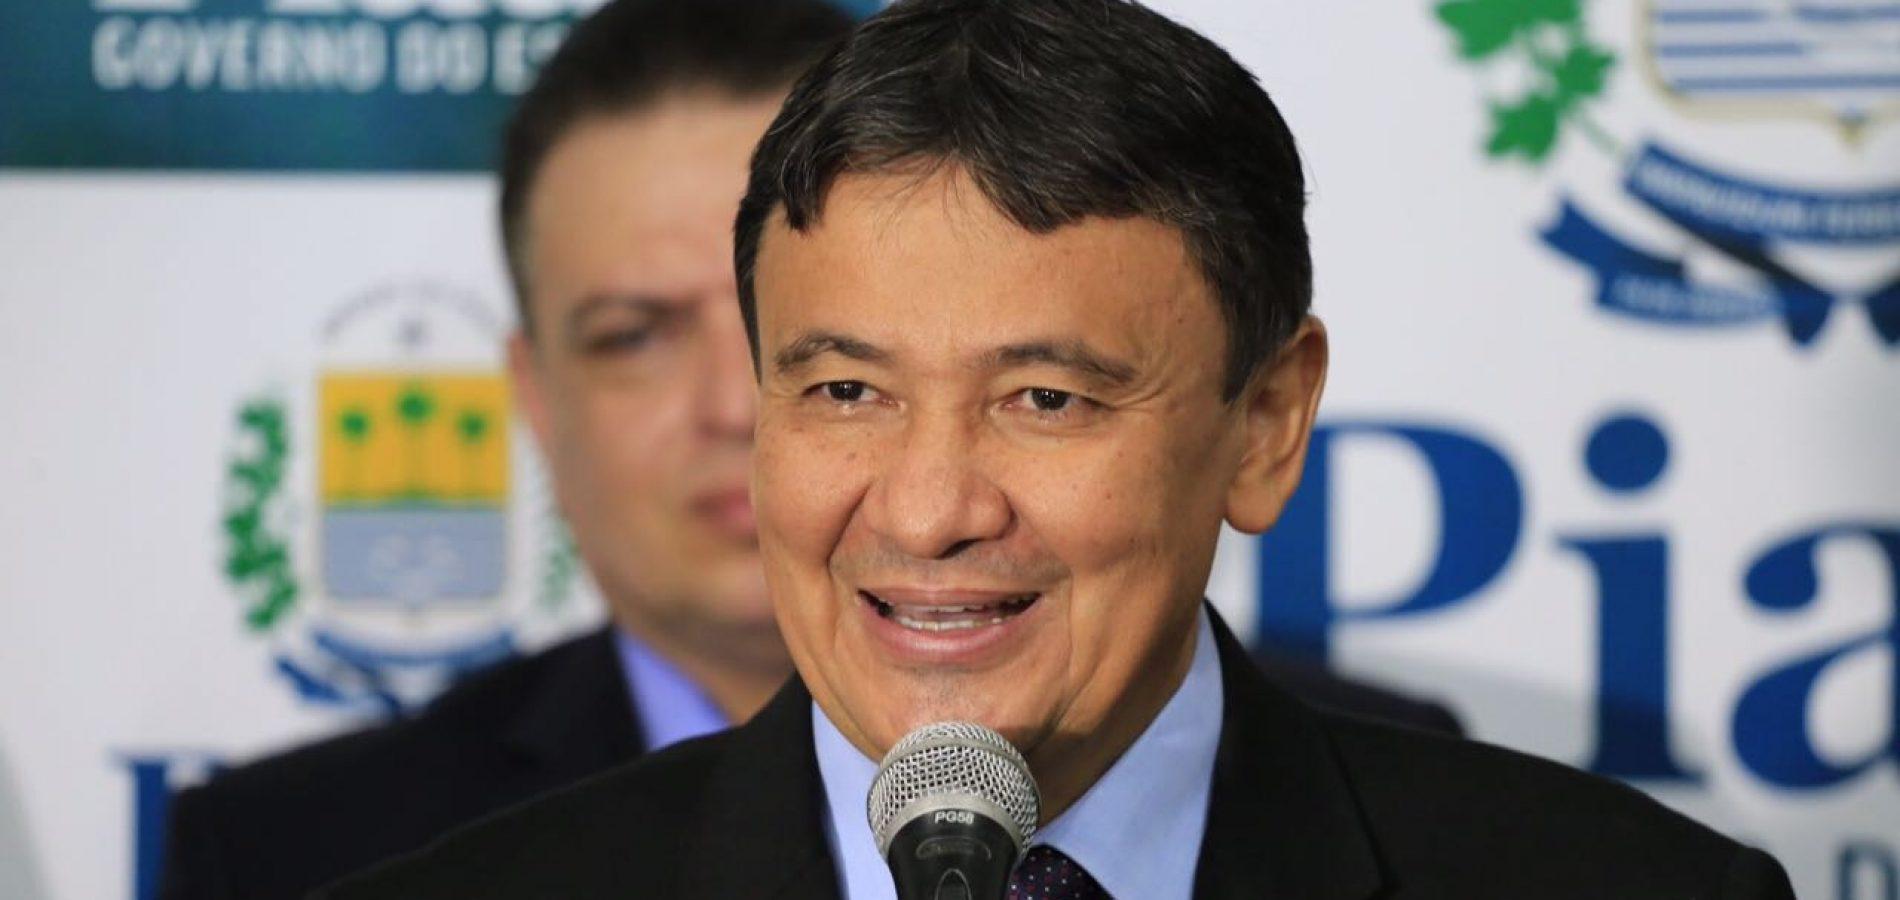 Governador anuncia vestibular da Universidade Aberta no Piauí